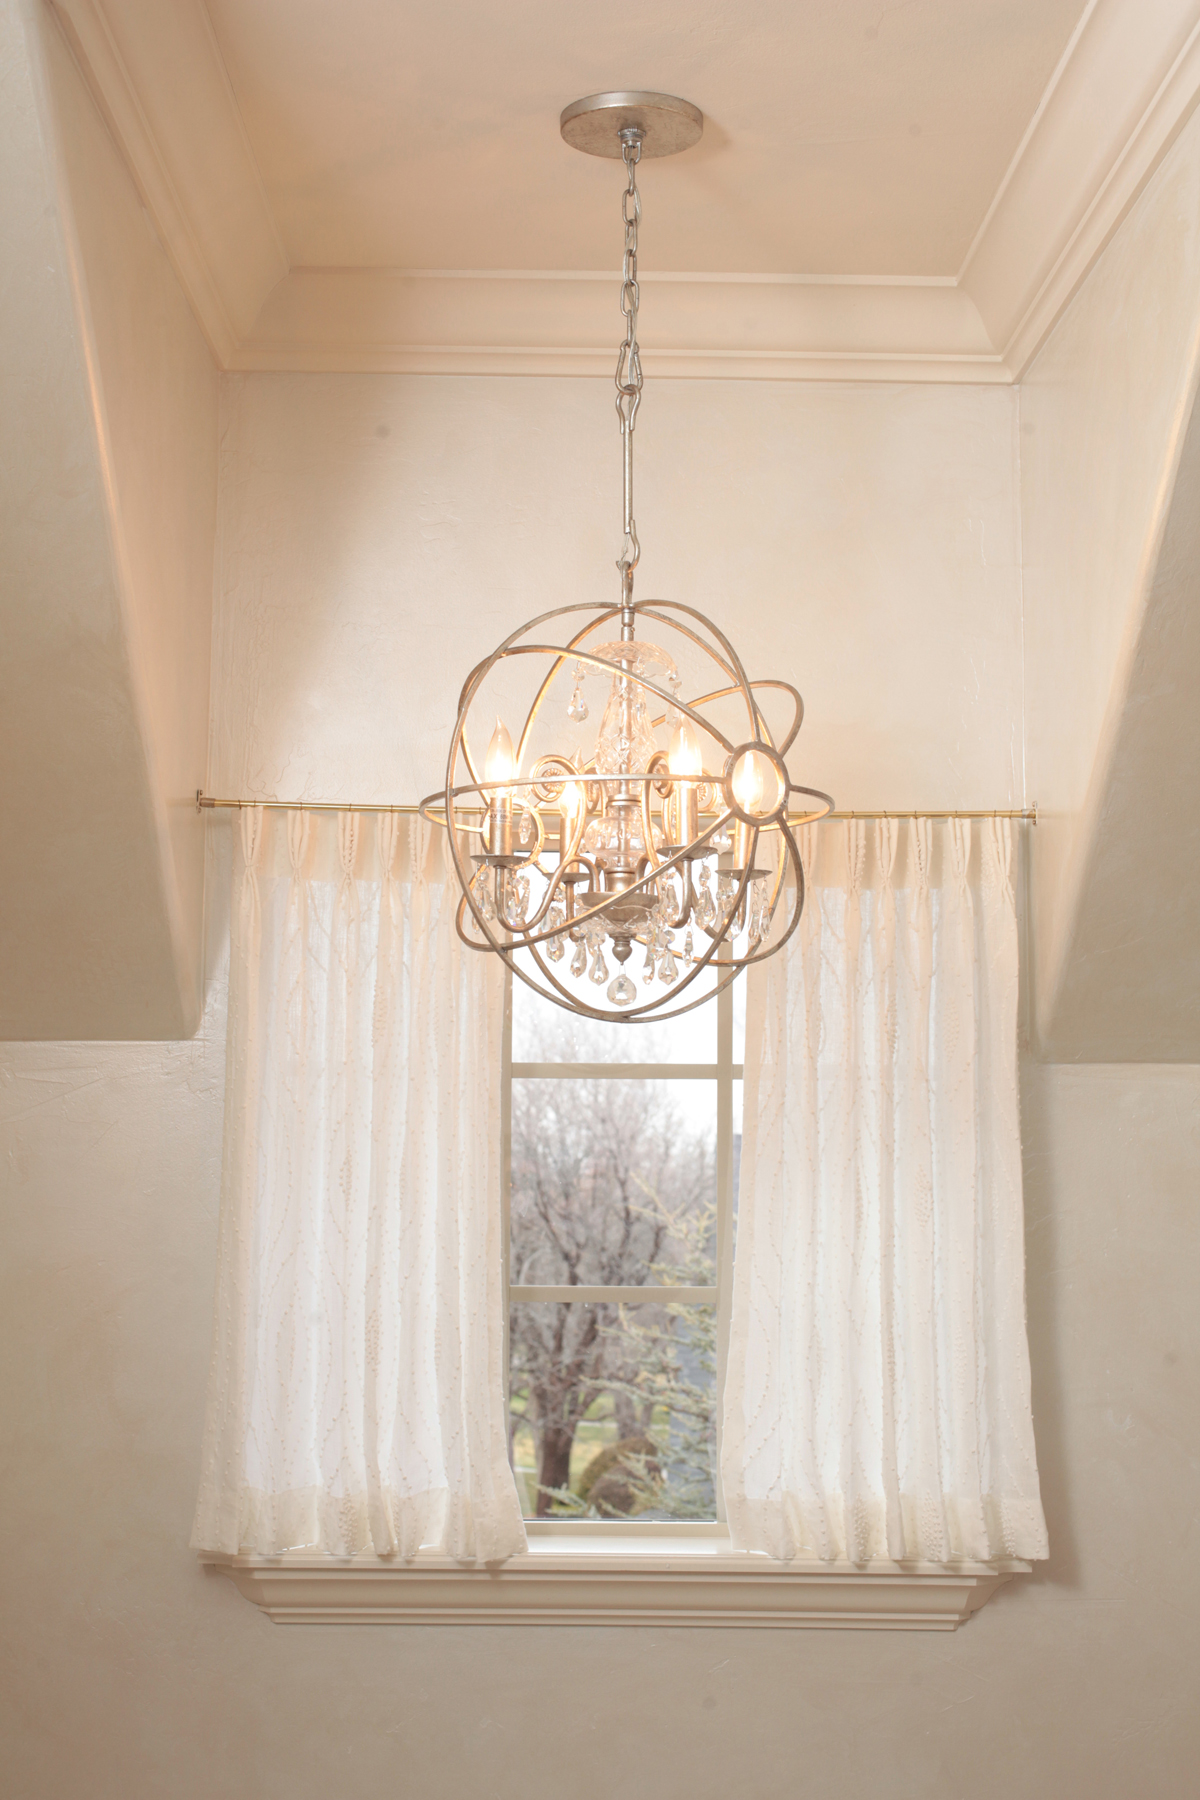 PINK  - chandelier.jpg